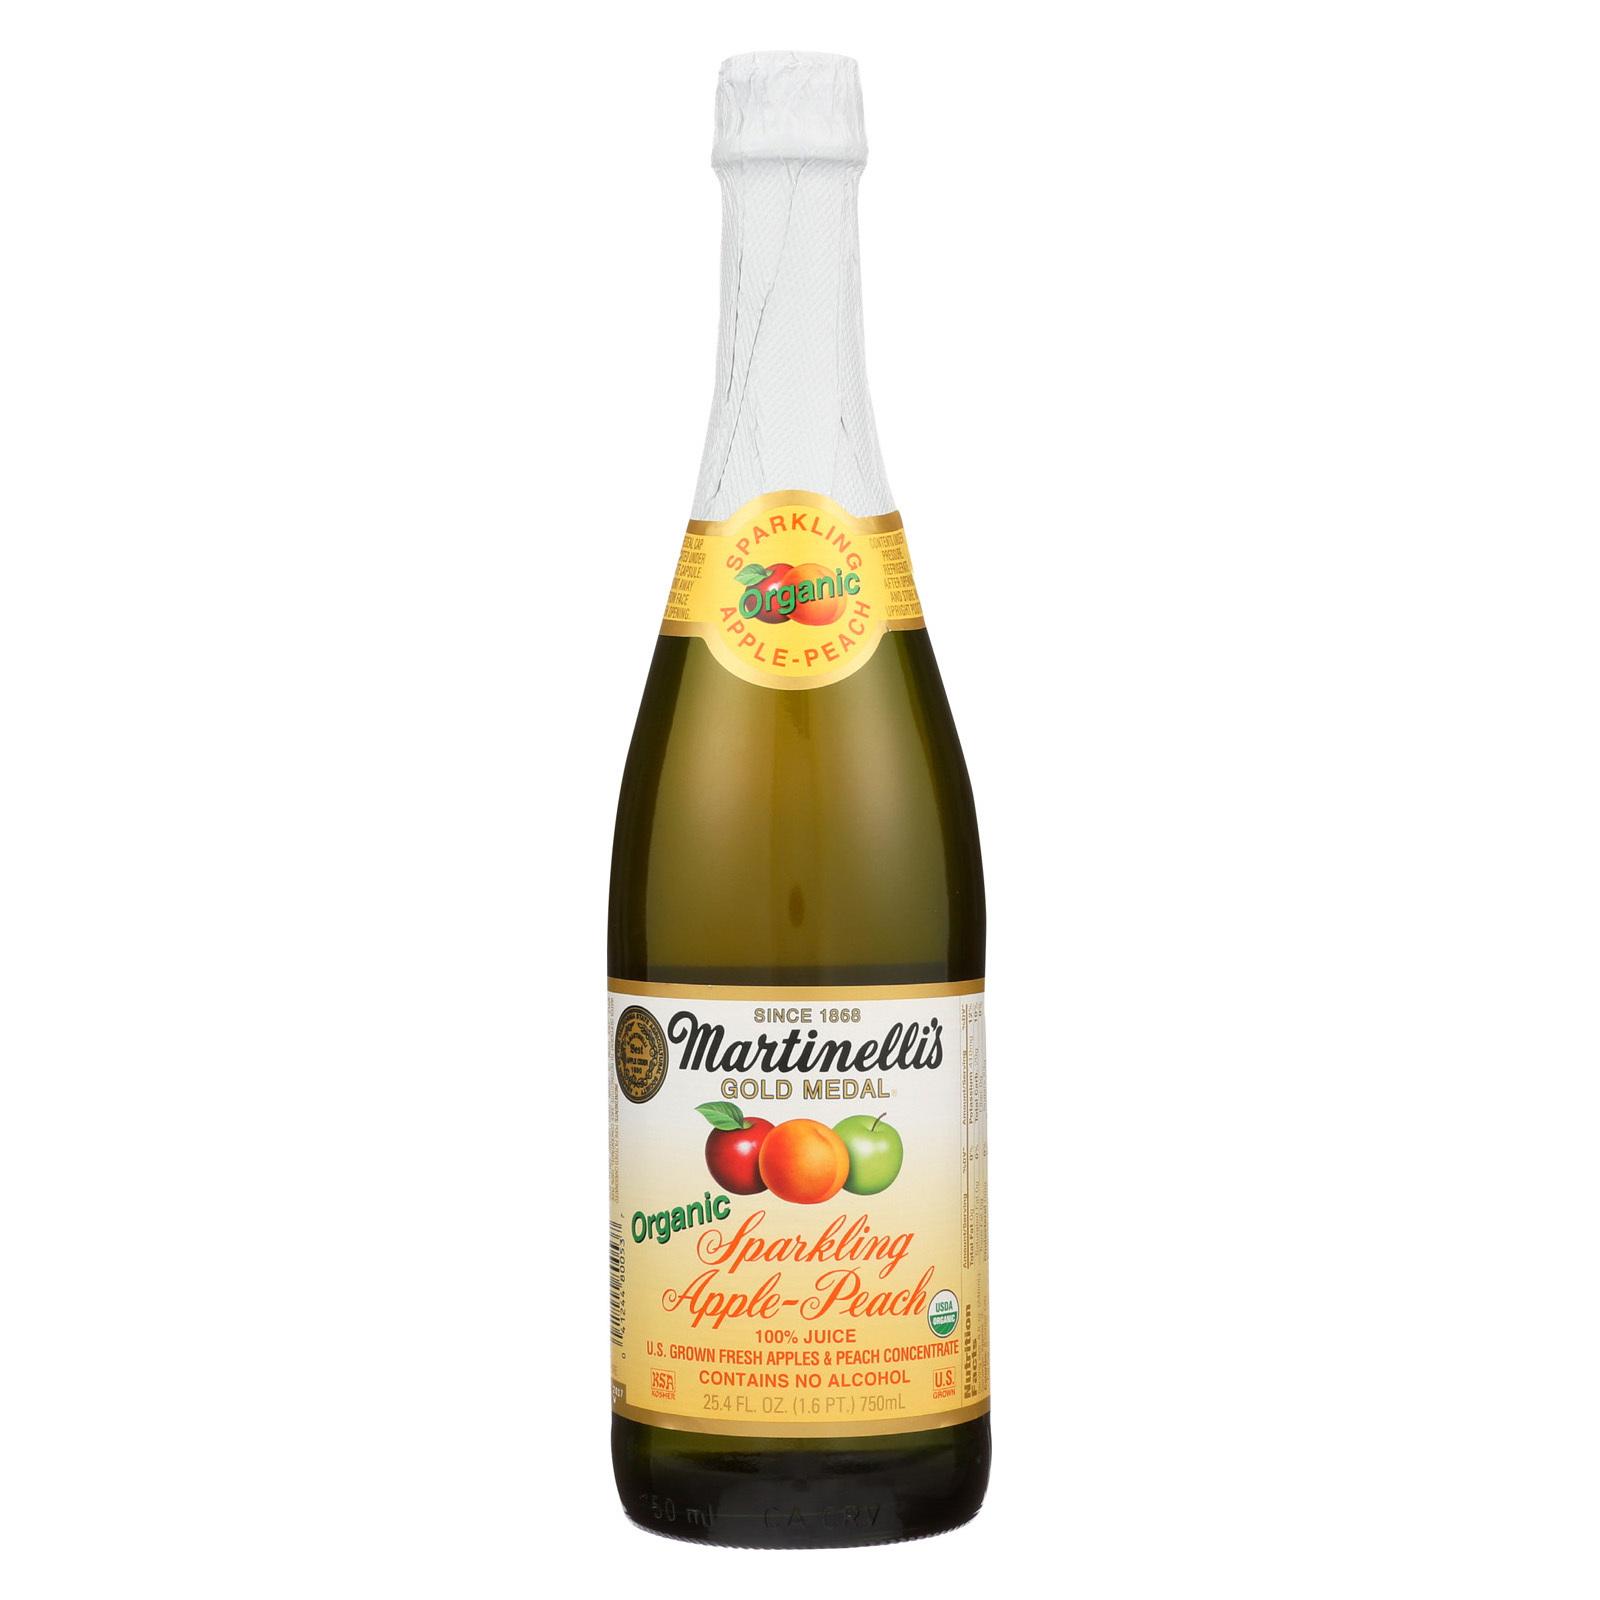 Martinelli's Organic Sparkling - Apple Peach - Case of 12 - 25.4 fl oz